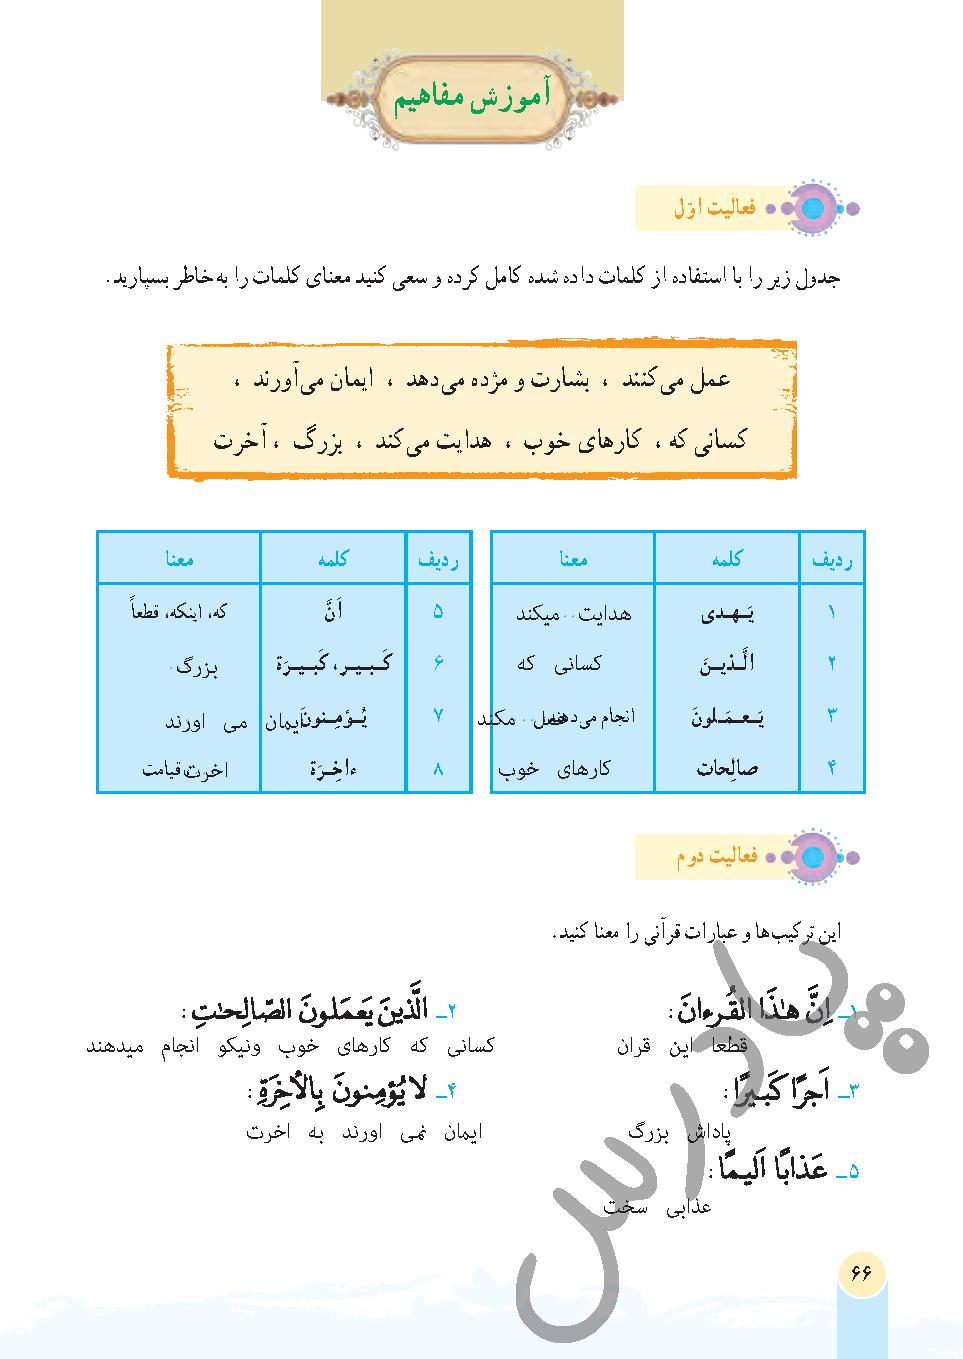 پاسخ فعالیت درس 7 قرآن هفتم - جلسه اول